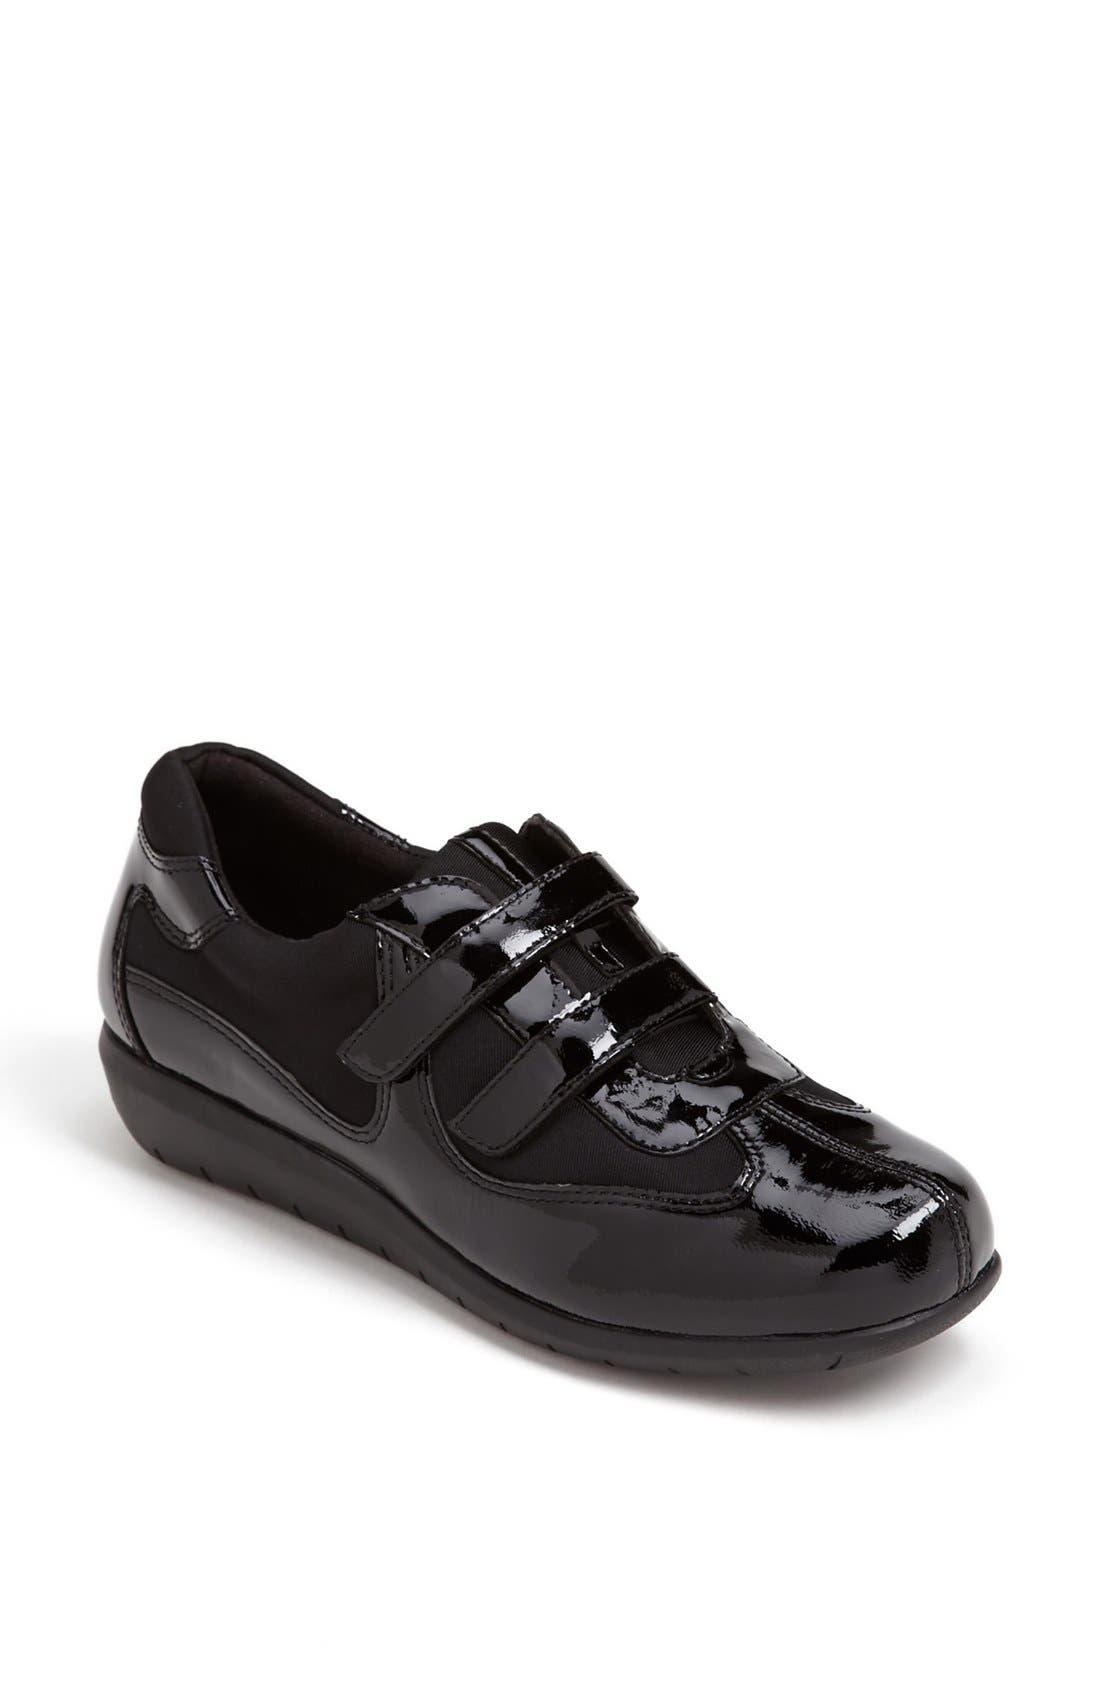 Alternate Image 1 Selected - Softwalk® 'Montreal' Sneaker